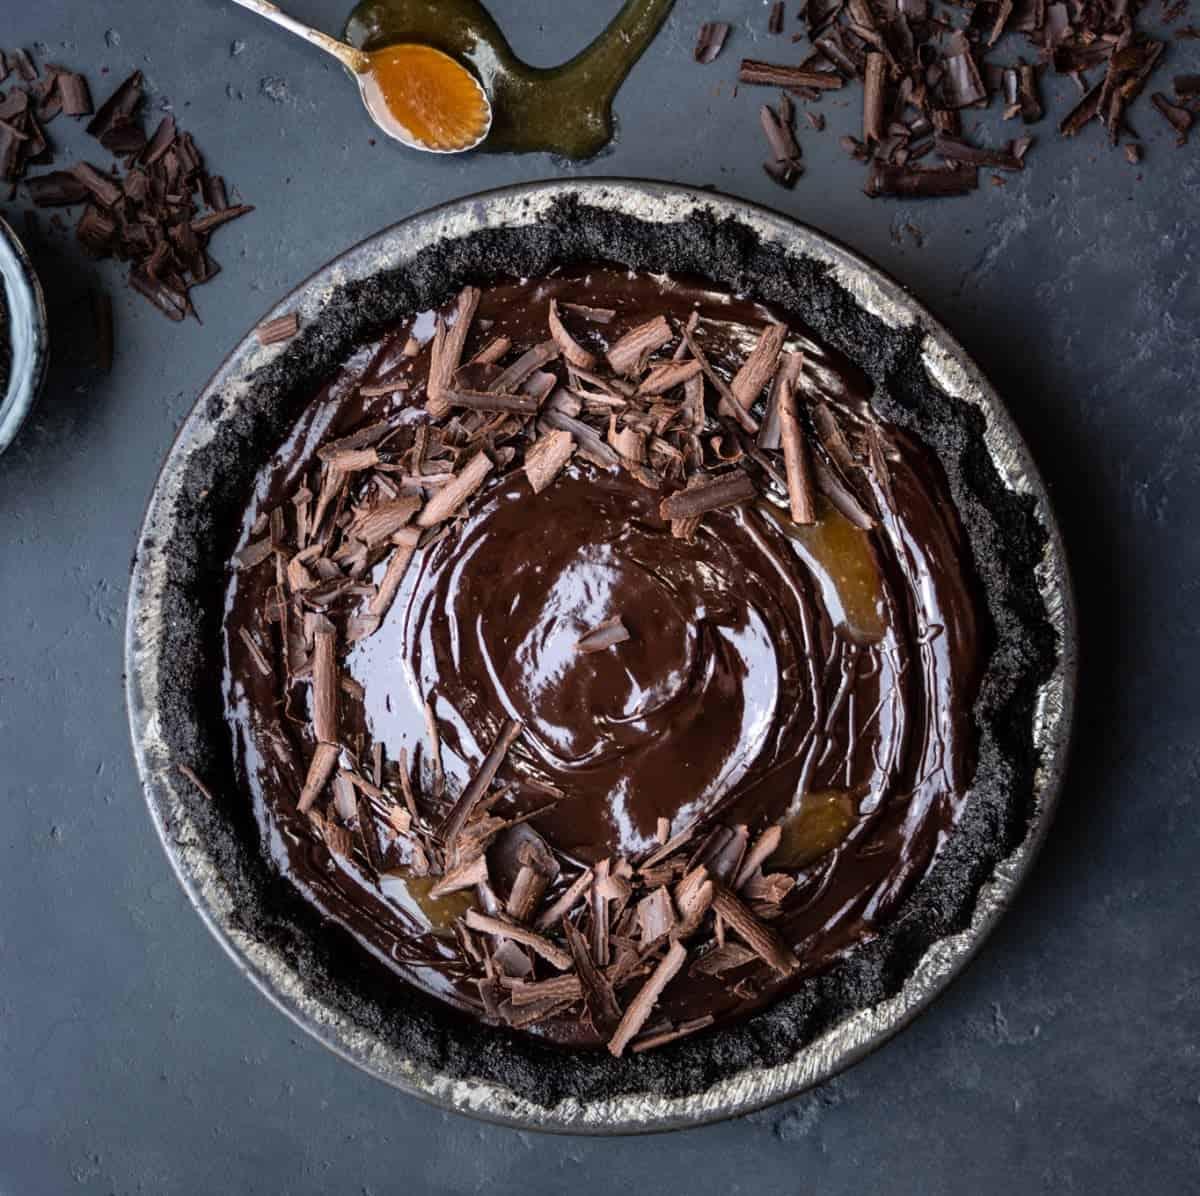 Decorating a no bake vegan chocolate tart with salted caramel and chocolate curls